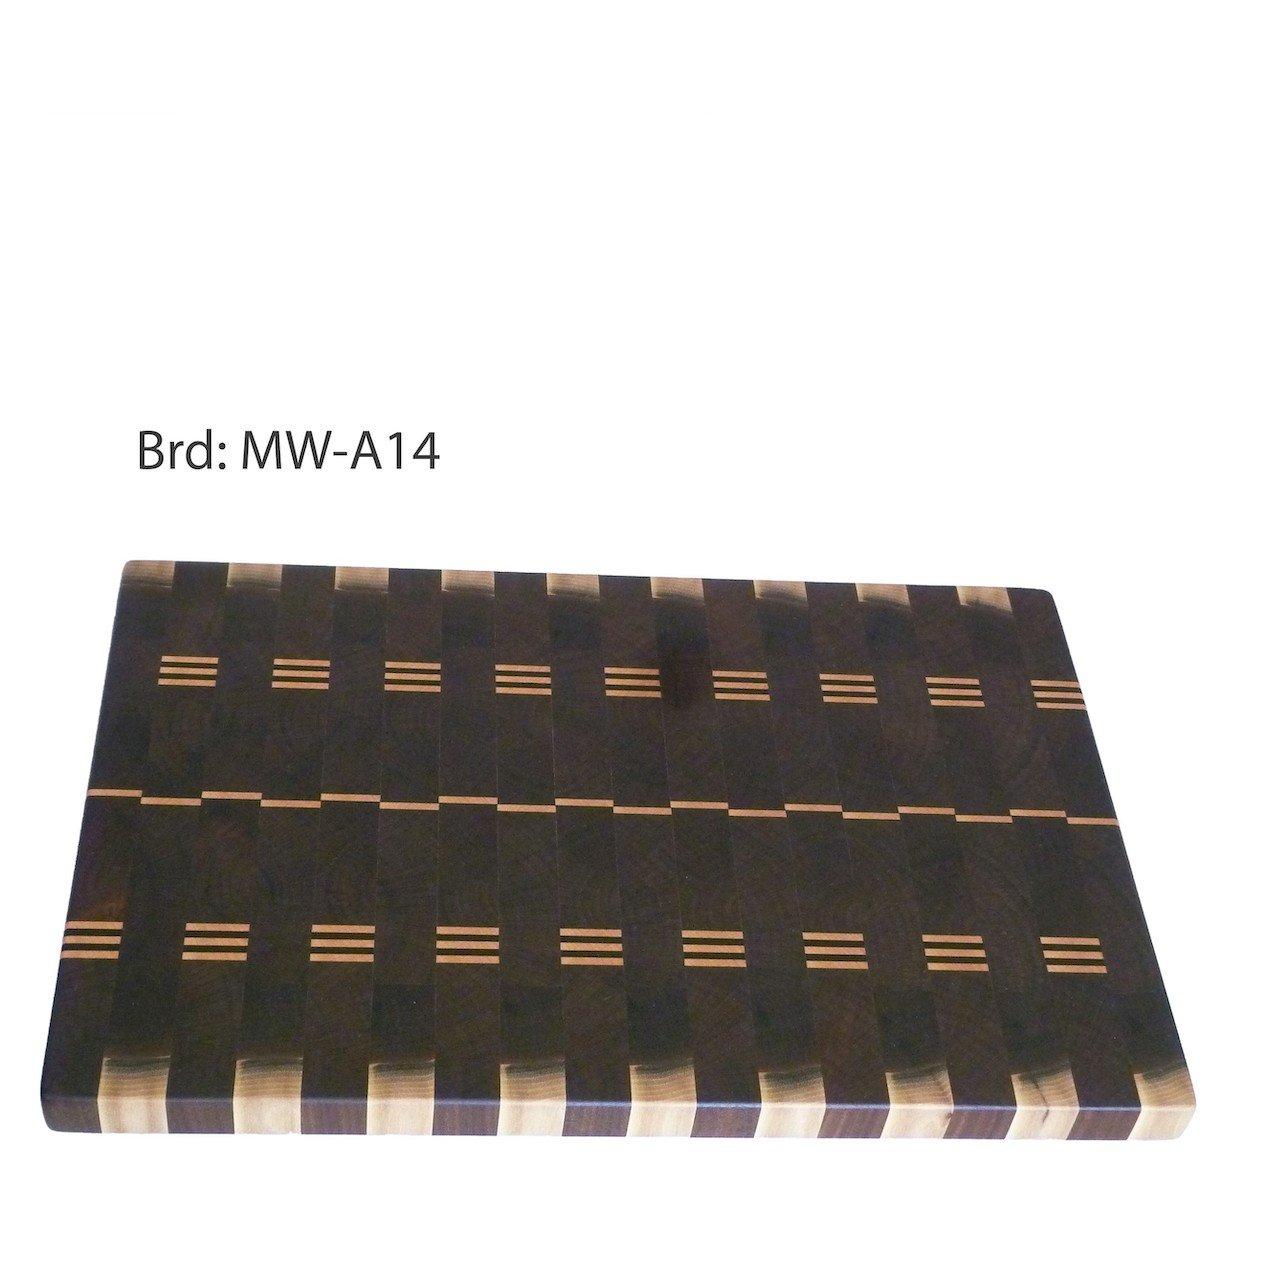 MW-A14